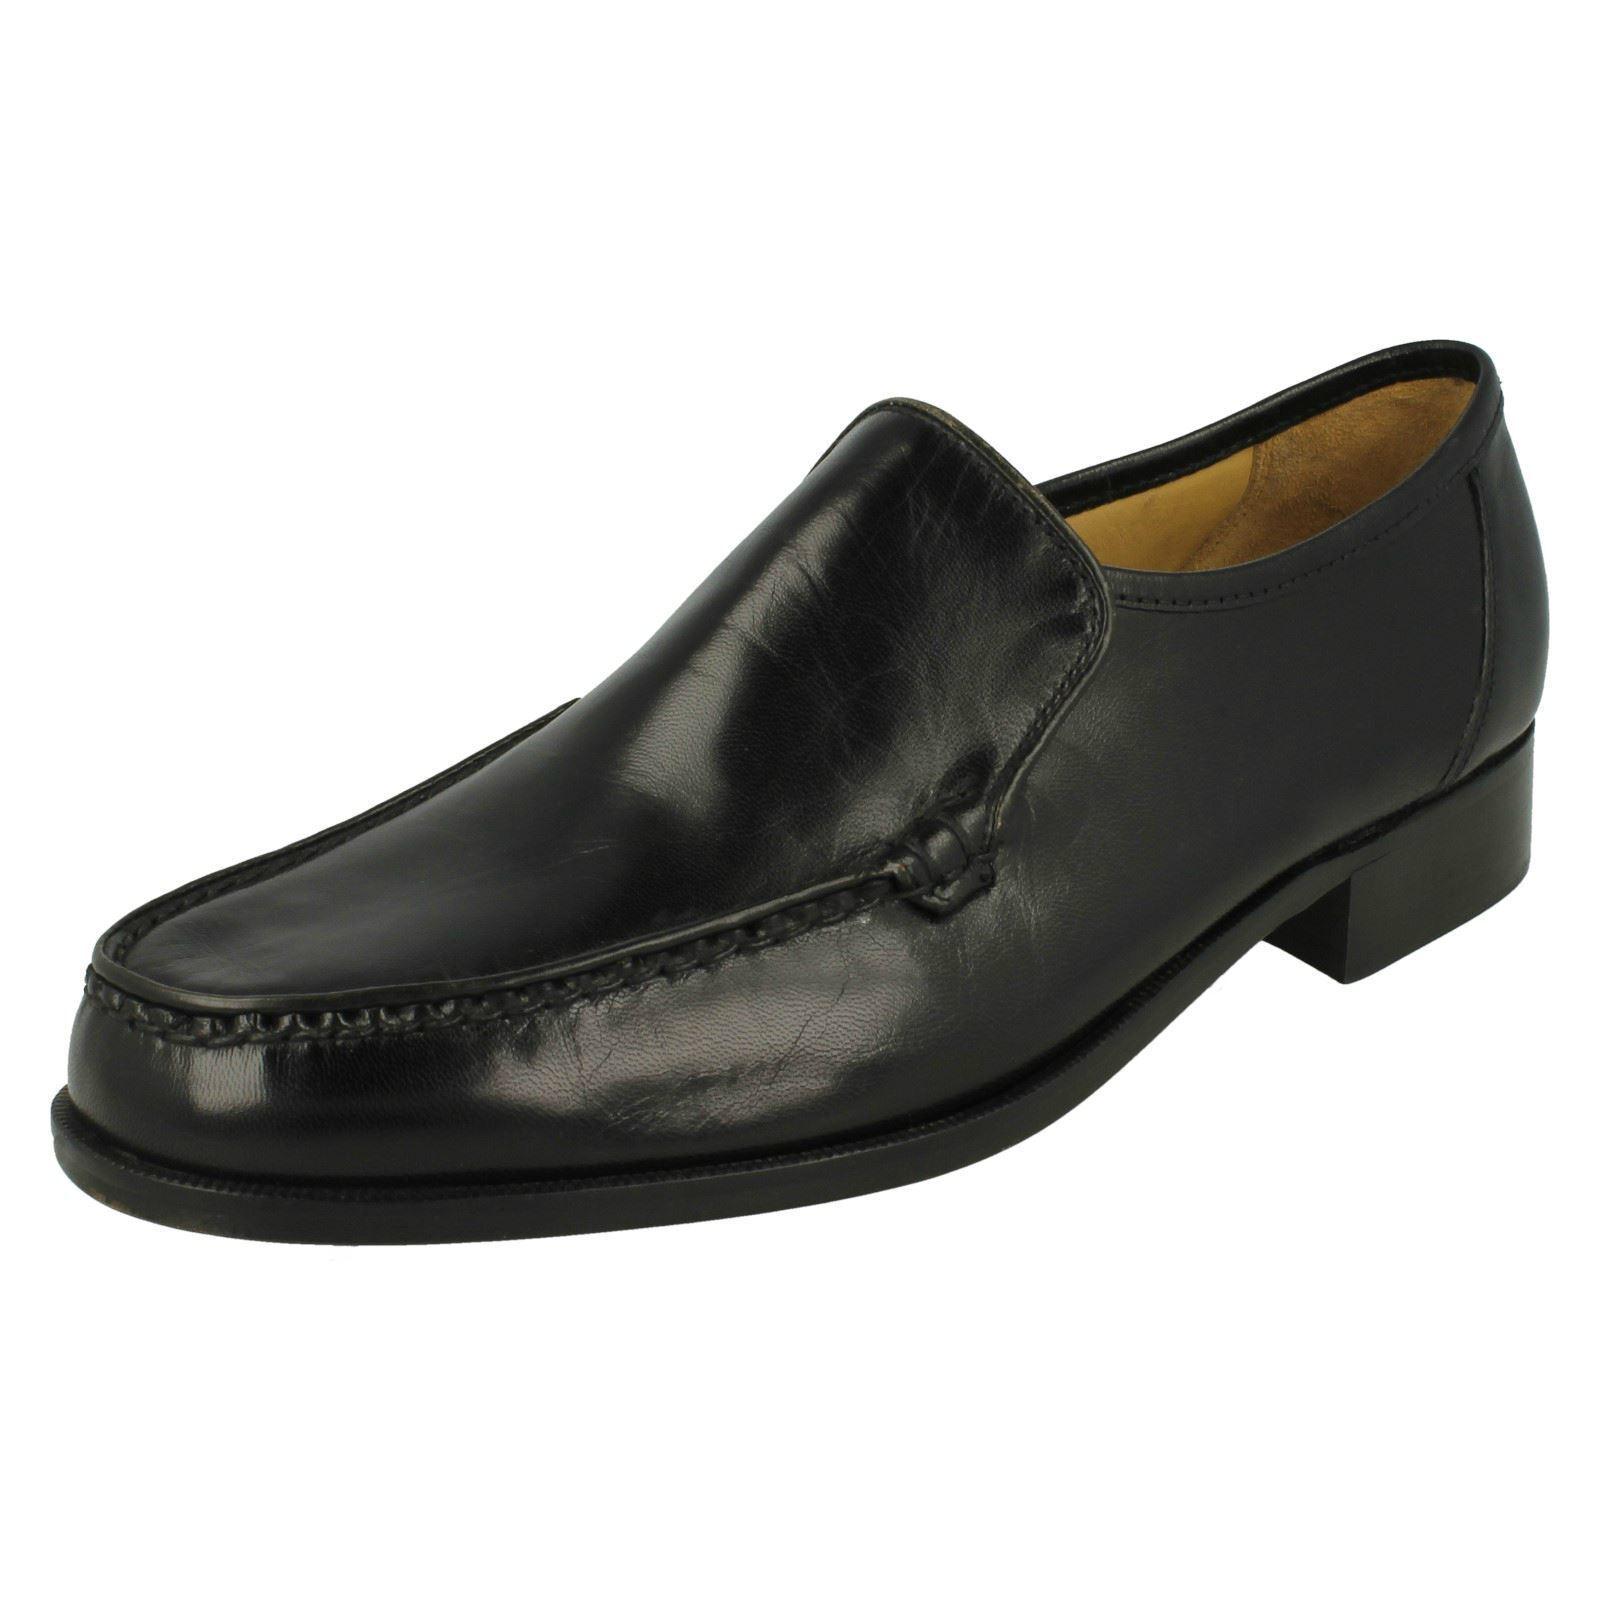 Mens Illinois Black Leather Slip On Shoe By Thomas Blunt £79.99